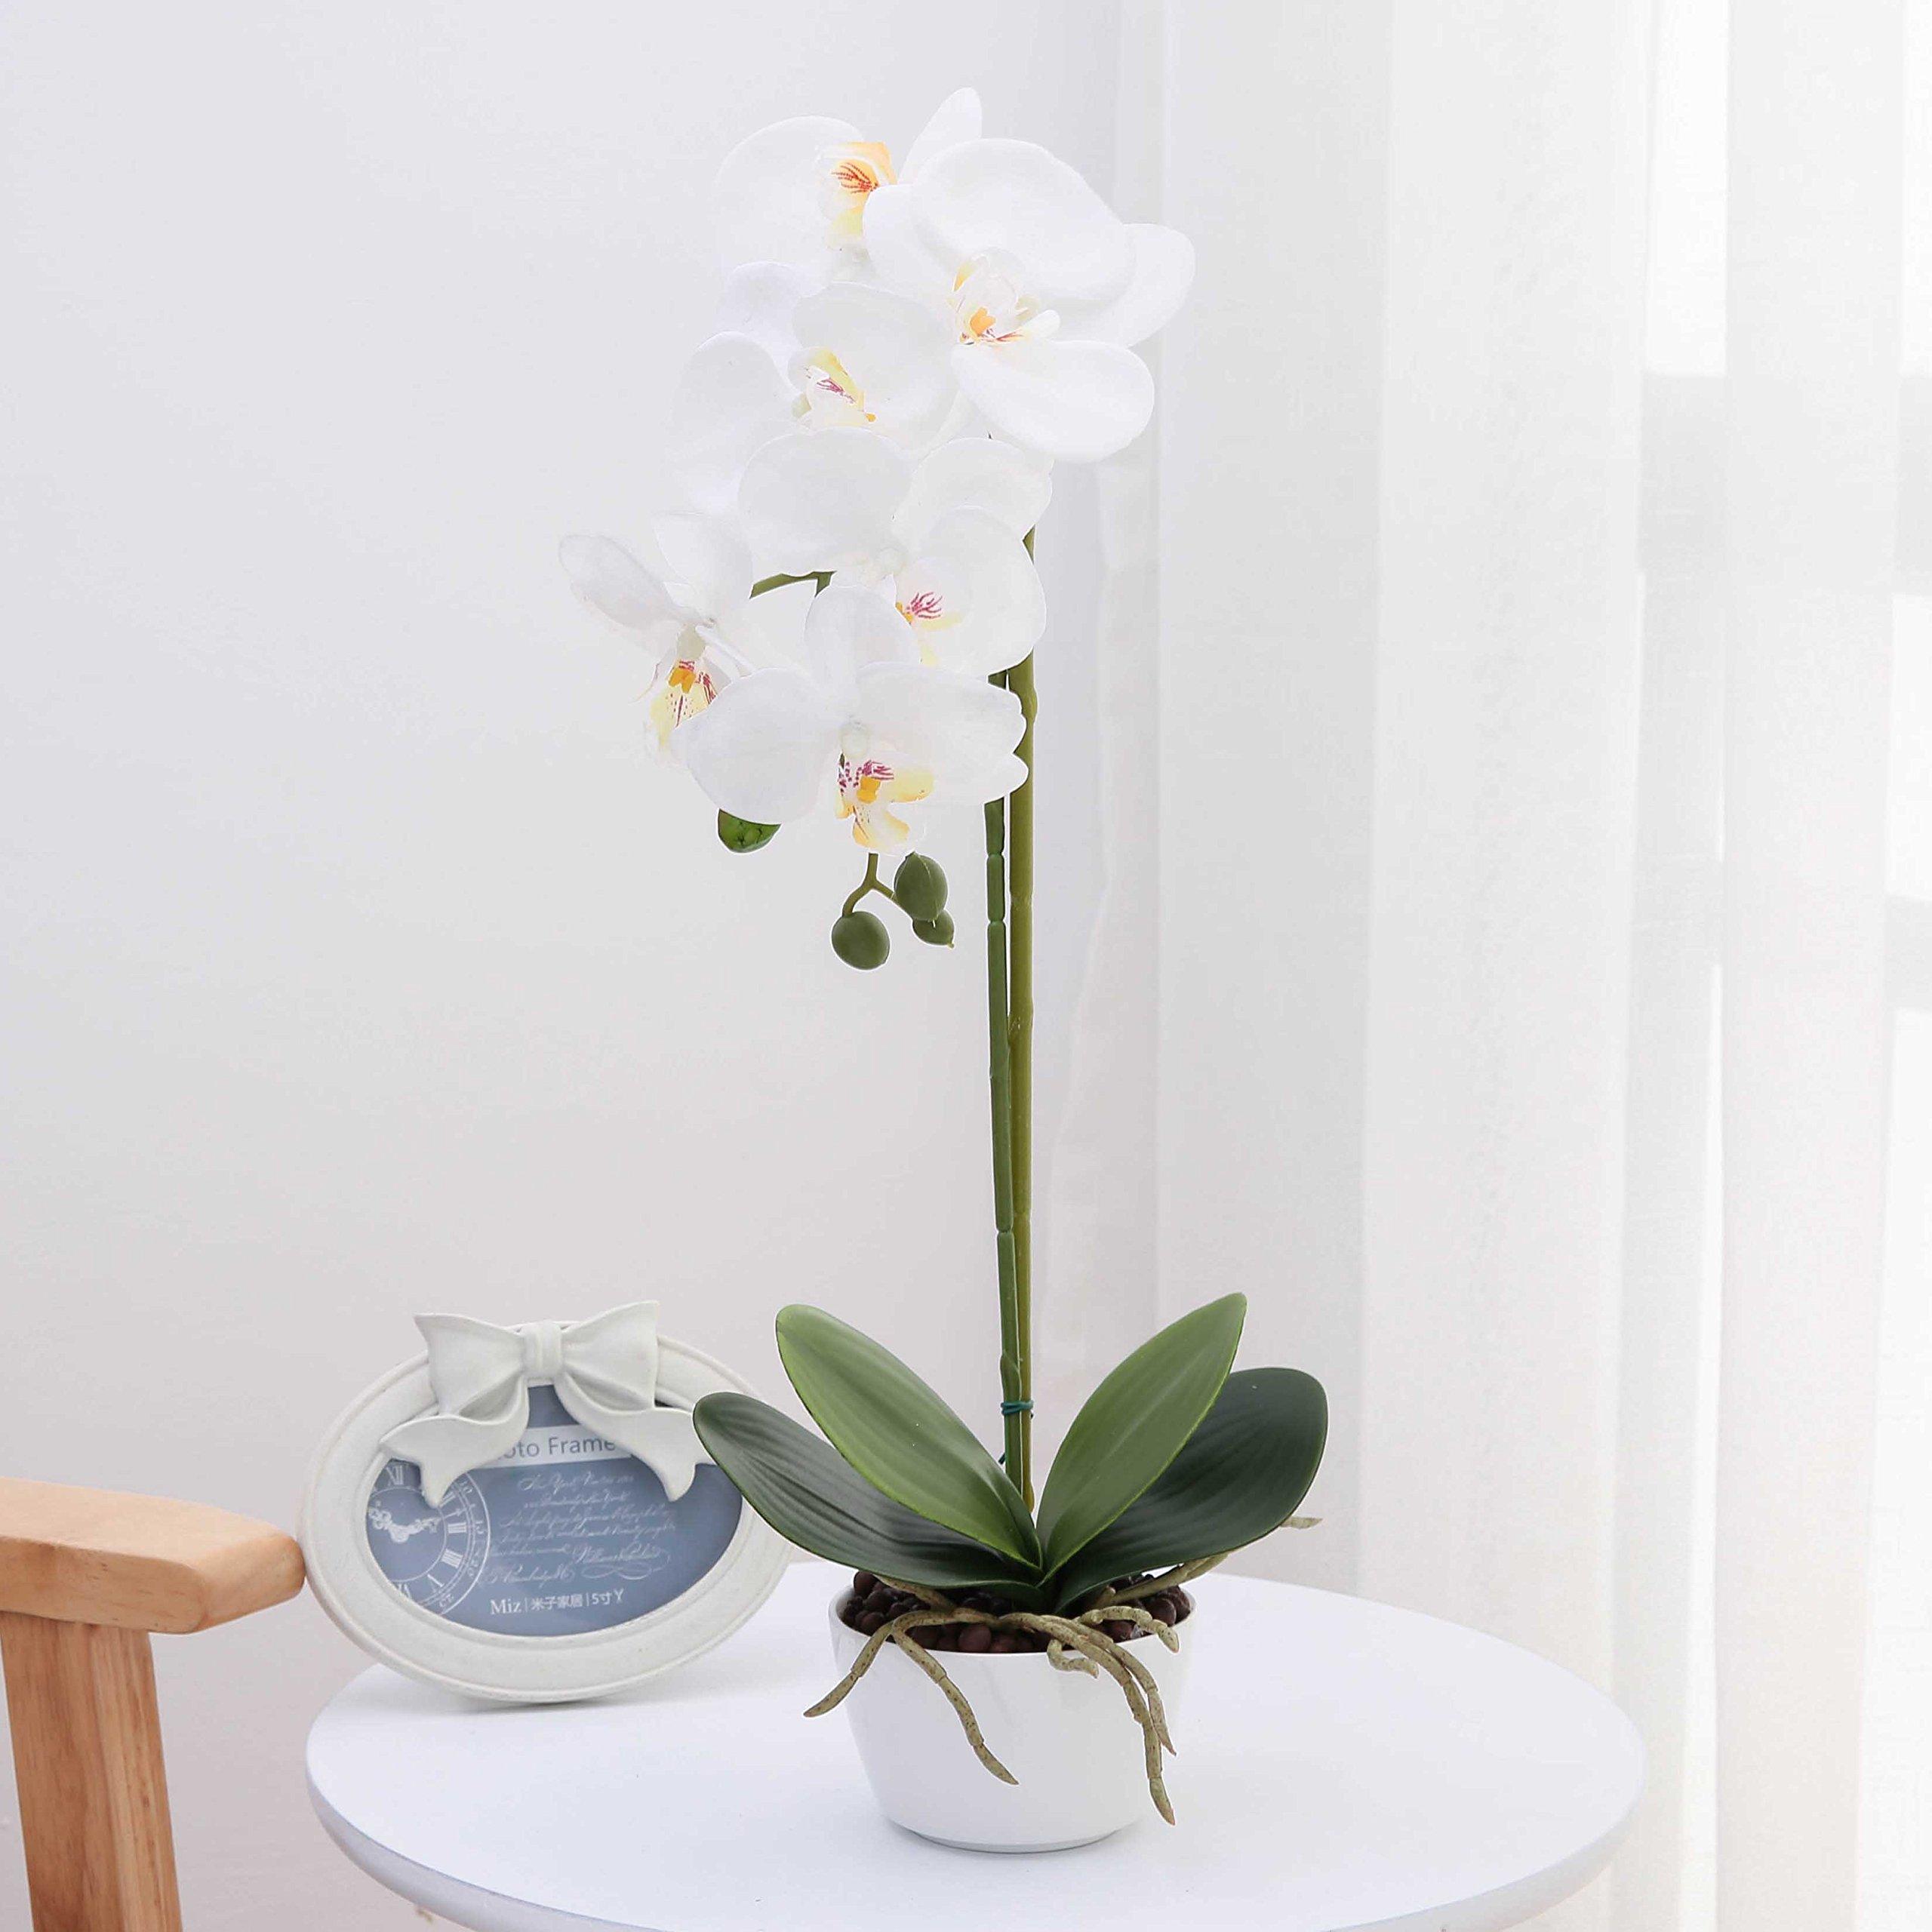 Livilan Silk Phalaenopsis Flower Arrangement, Artificial Orchid Flowers with White Vase, Wedding Party Home Centerpiece Decor (White)